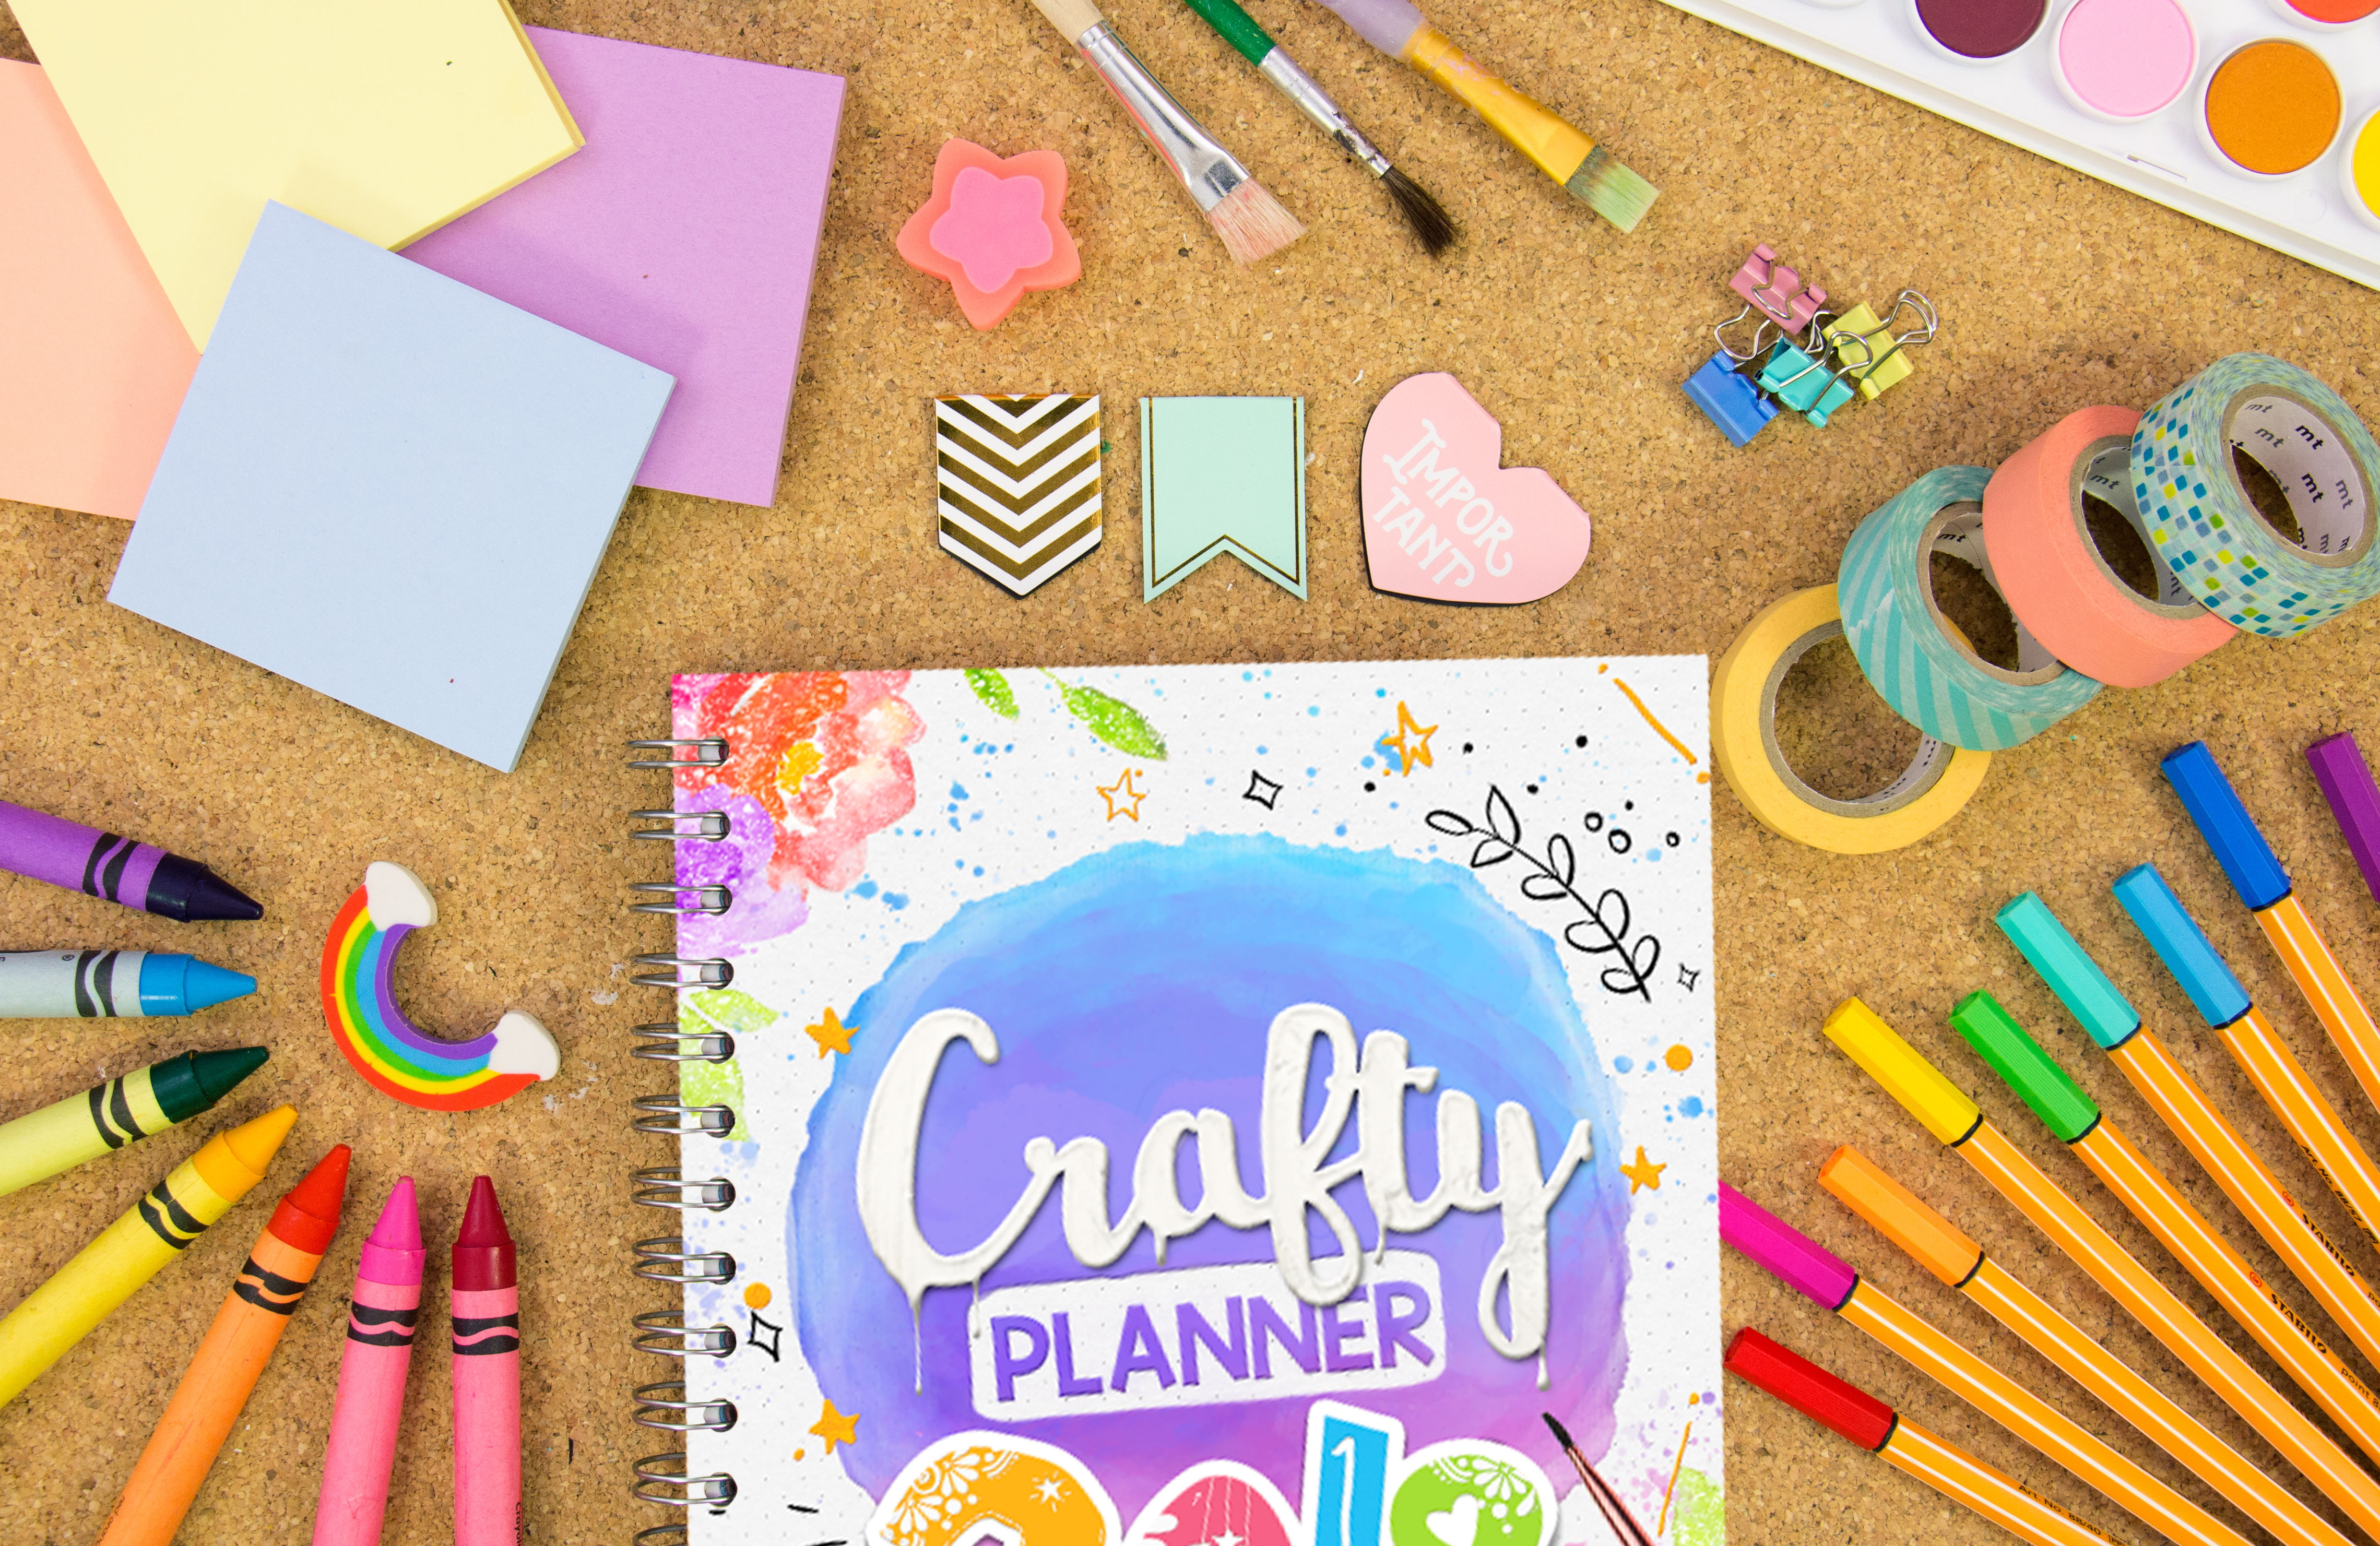 5 razones crafty planner